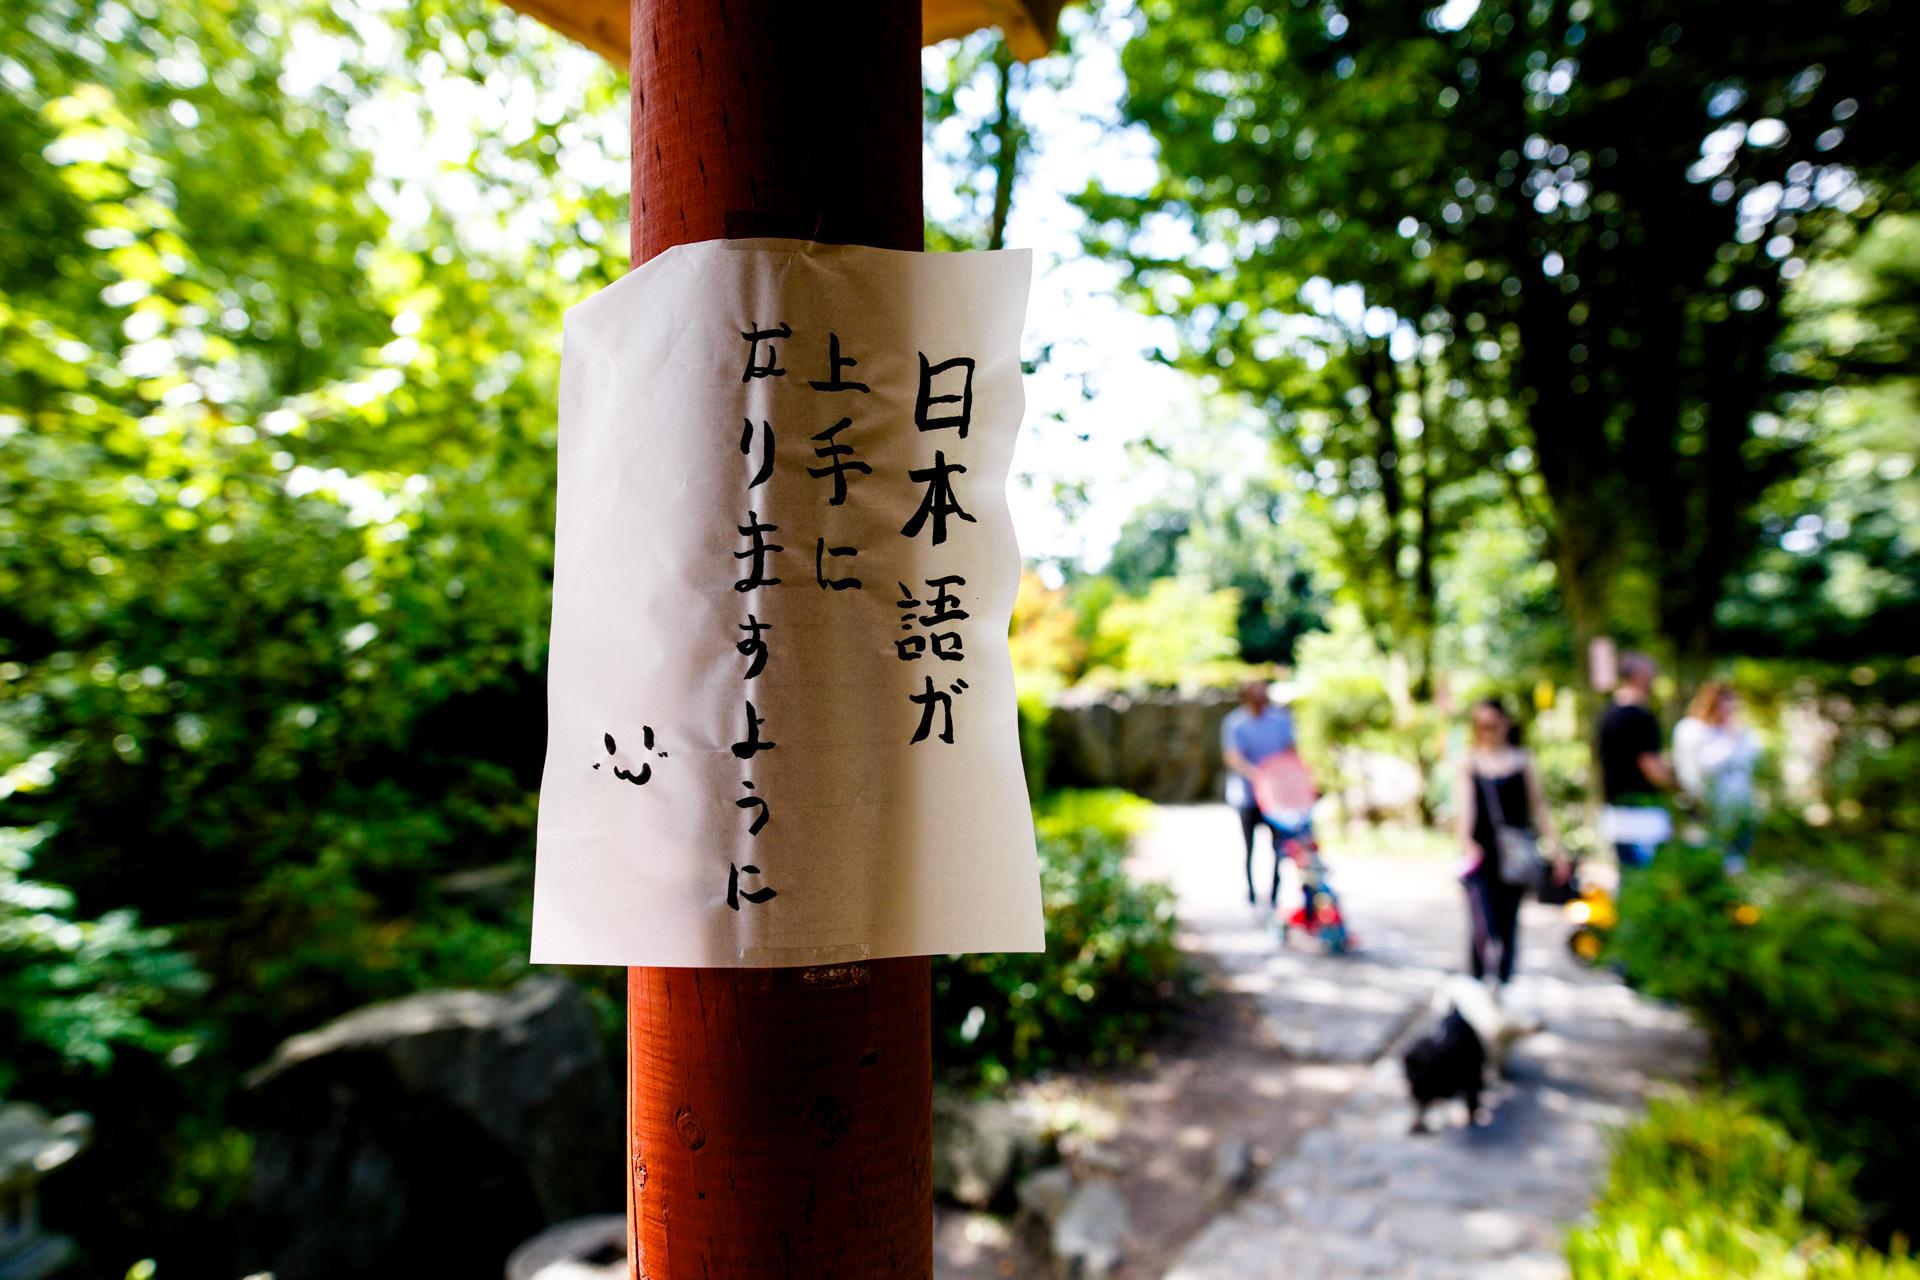 Andrew Wilson Photography Liverpool (18) Festival Gardens Japanese Tanzaku Tanabata.jpg